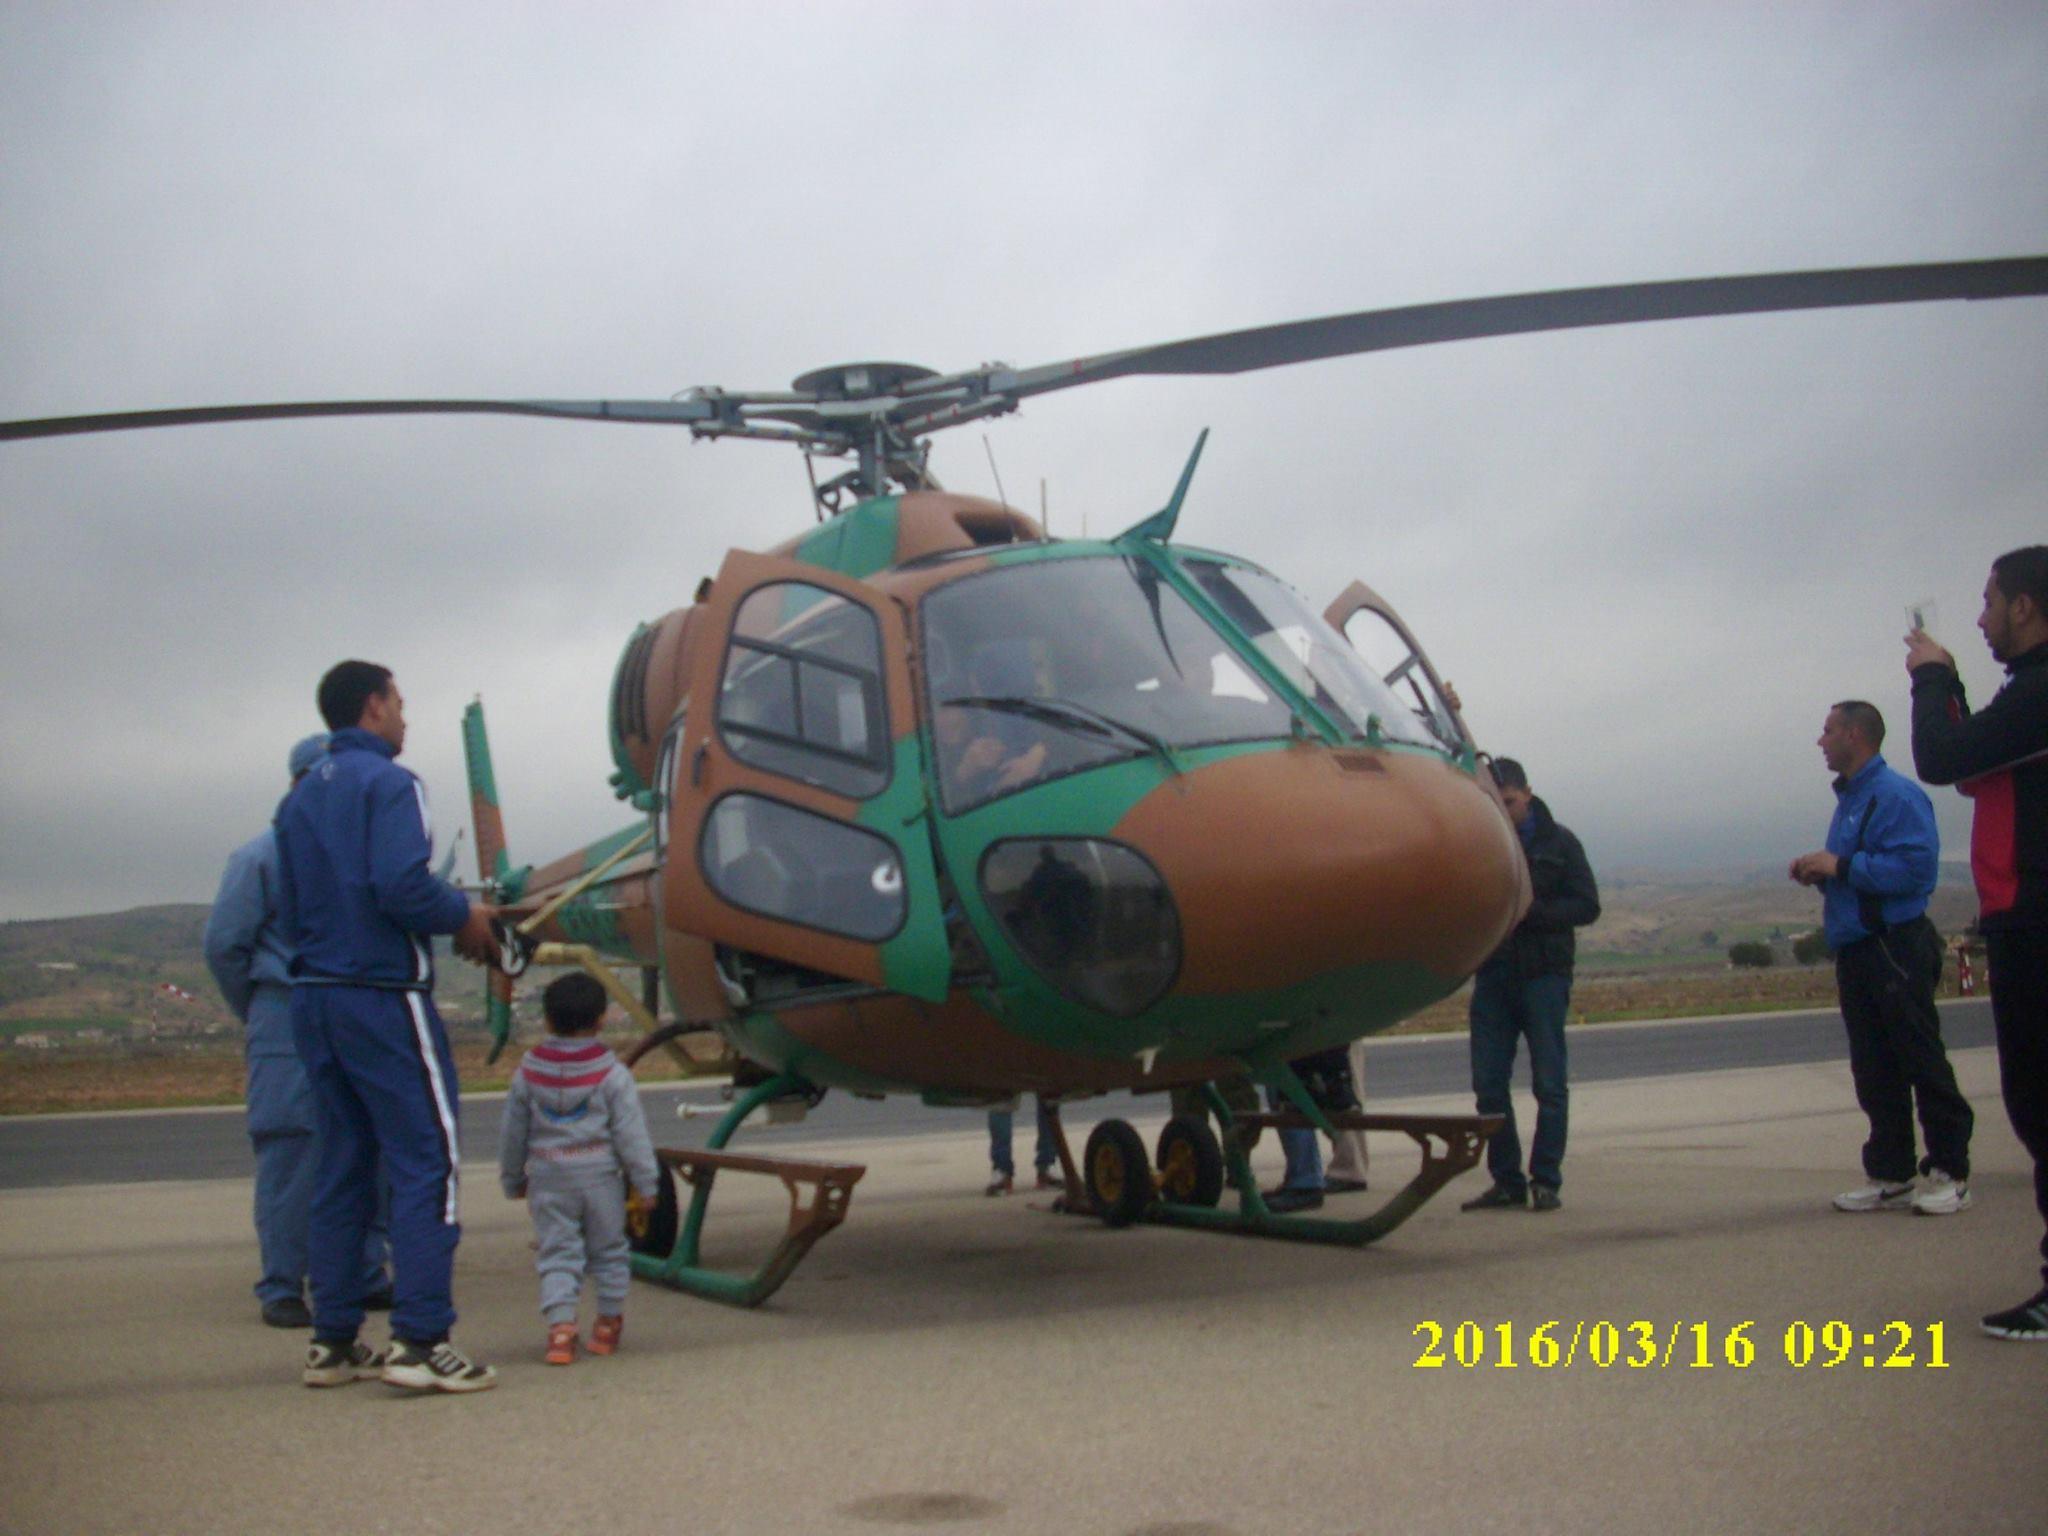 صور مروحيات القوات الجوية الجزائرية Ecureuil/Fennec ] AS-355N2 / AS-555N ] 25809853011_704b7de27e_o